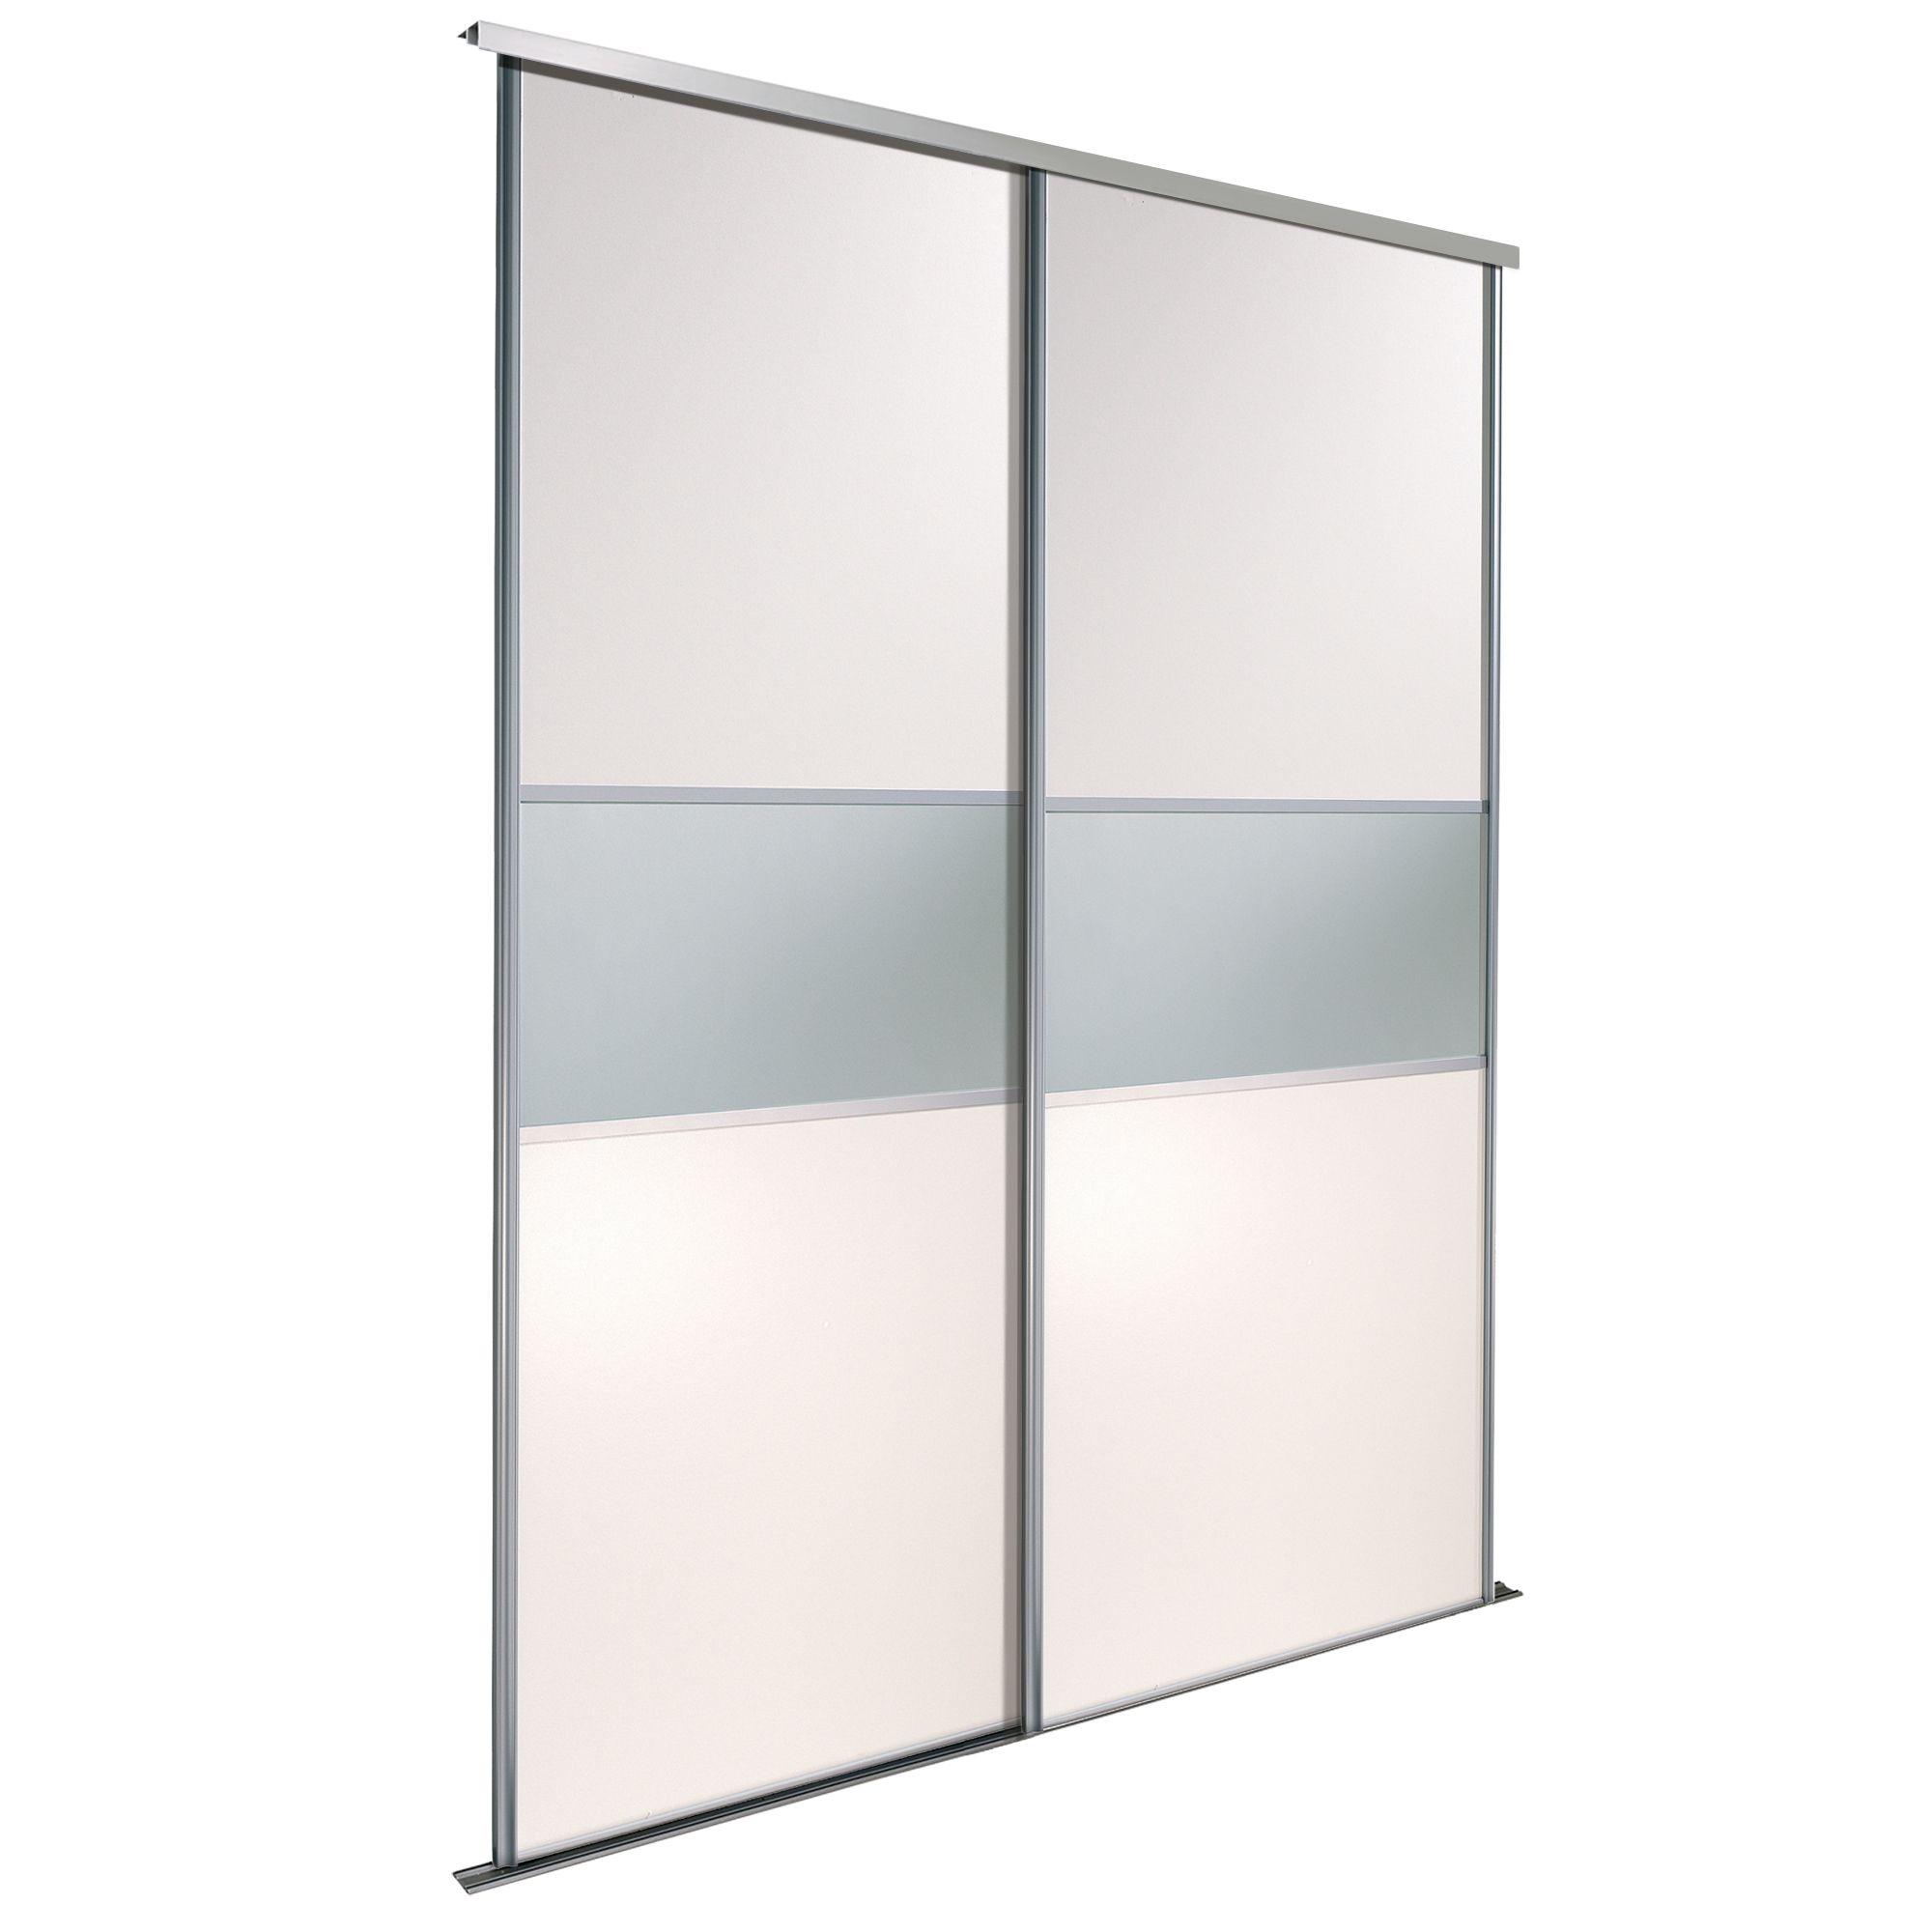 Fineline White Mirror Sliding Wardrobe Door Kit (h)2220 Mm (w)762 Mm, Pack Of 2